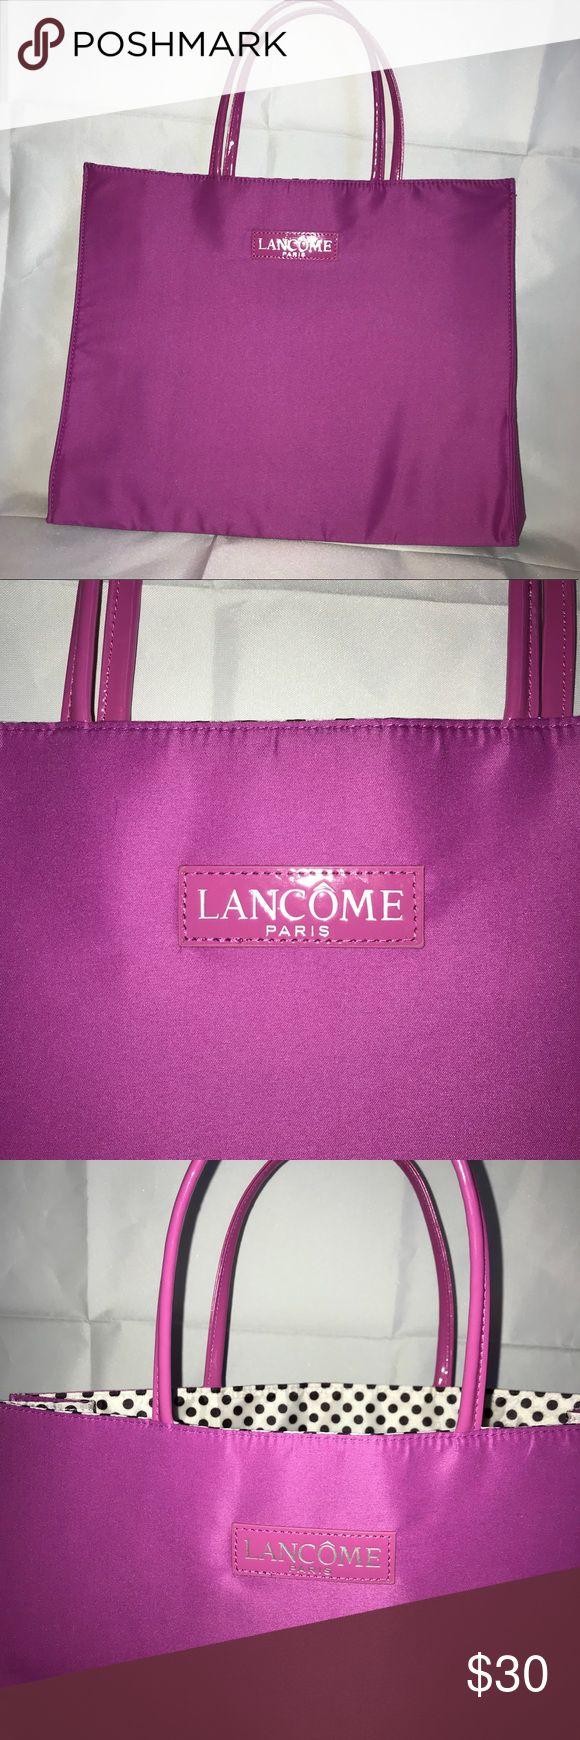 Pink and polka dot Lancôme Paris large tote bag Lancôme Paris Fuchsia and white and black polka dot  Polka dots in inside  Large tote No flaws or damage Lancome Bags Totes